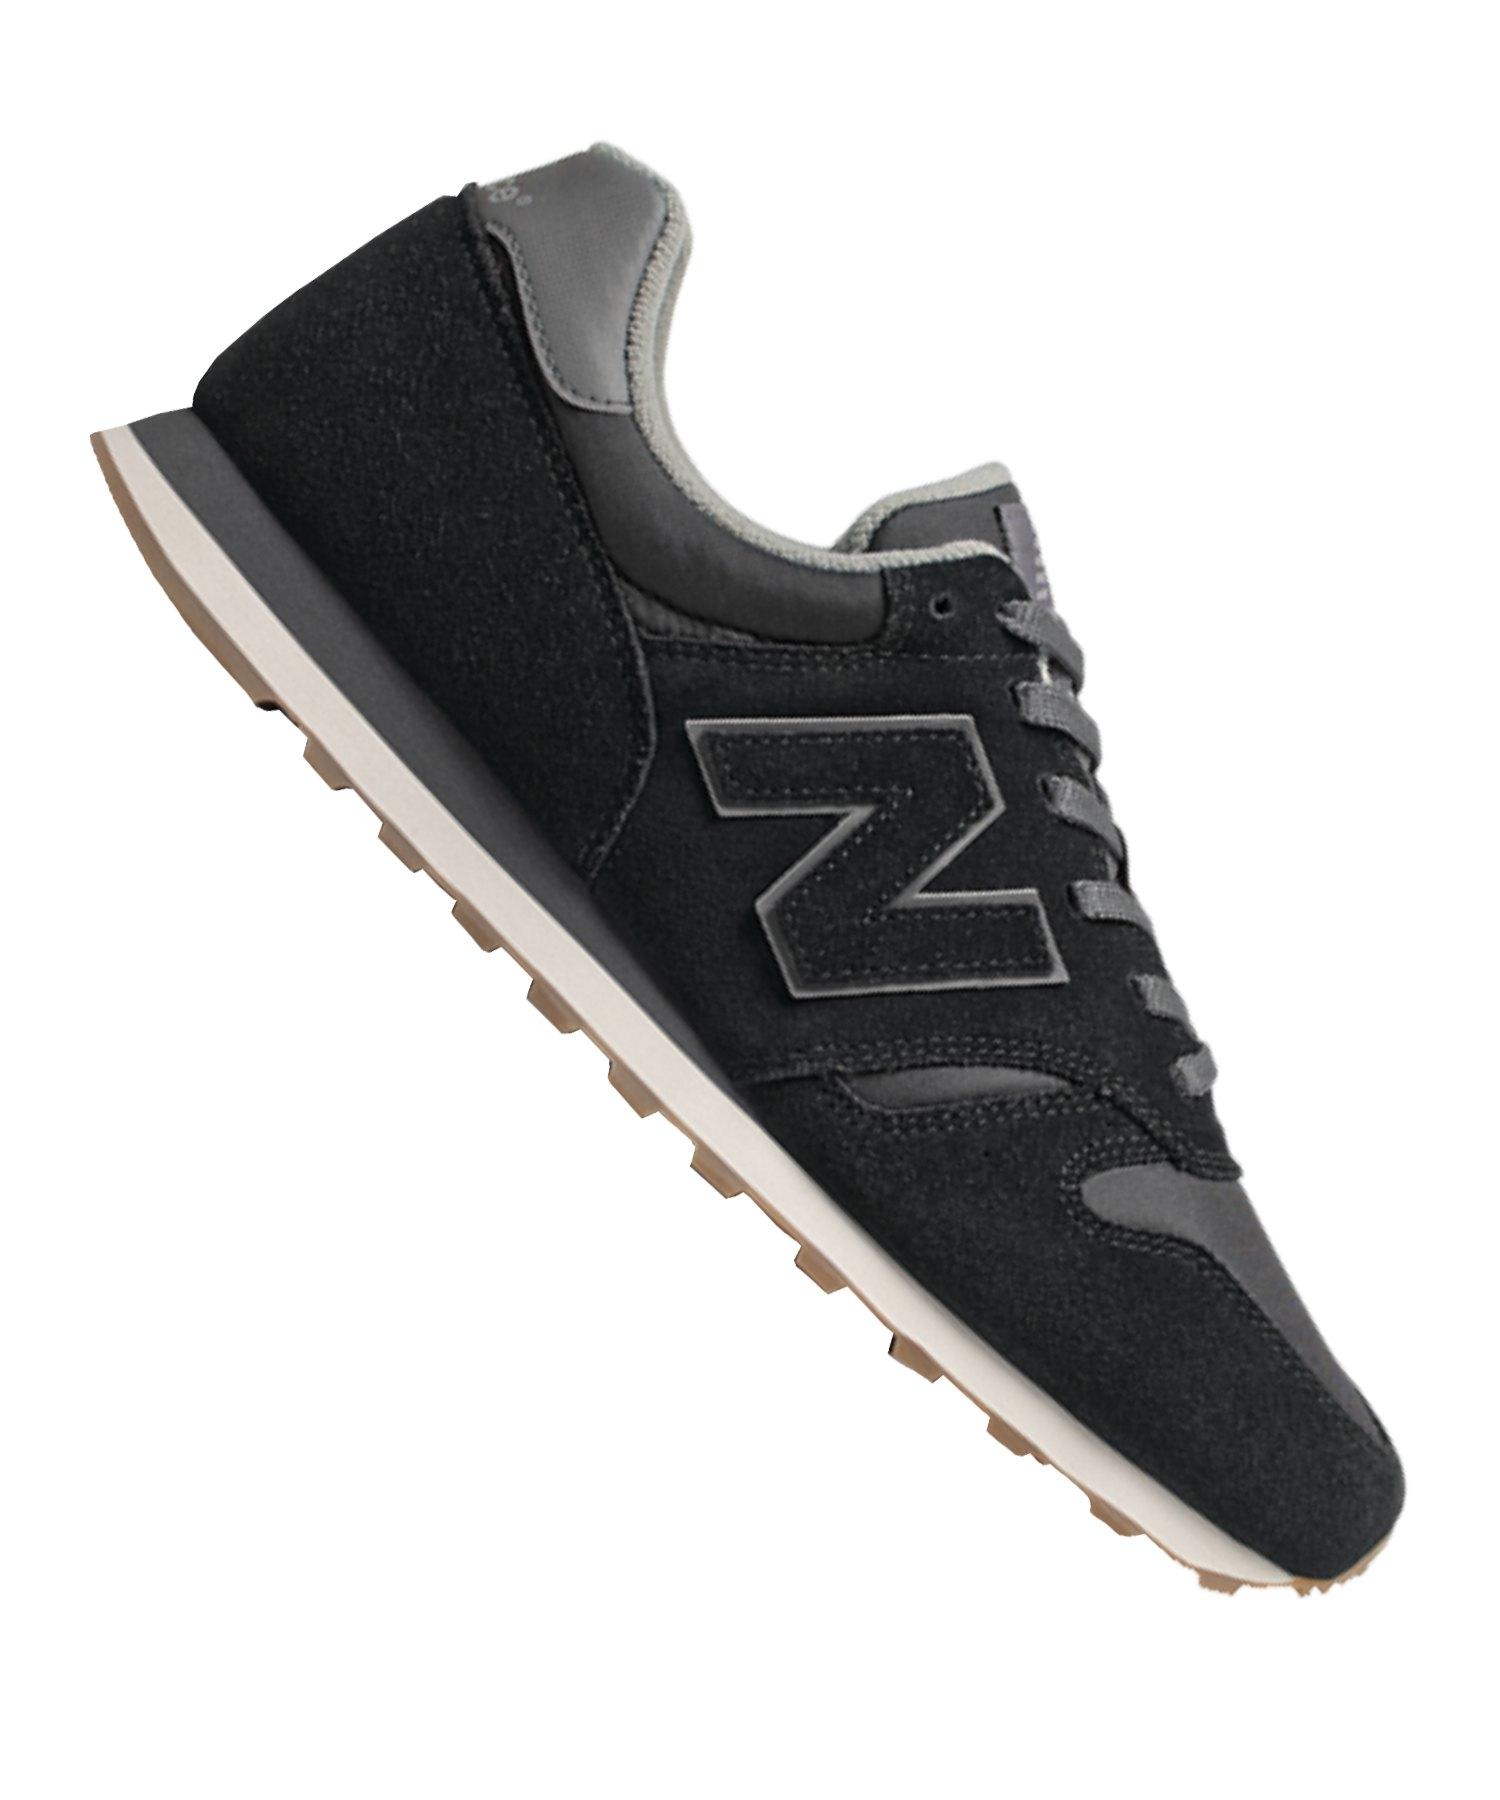 New Balance ML373 D Sneaker Schwarz F8 - schwarz